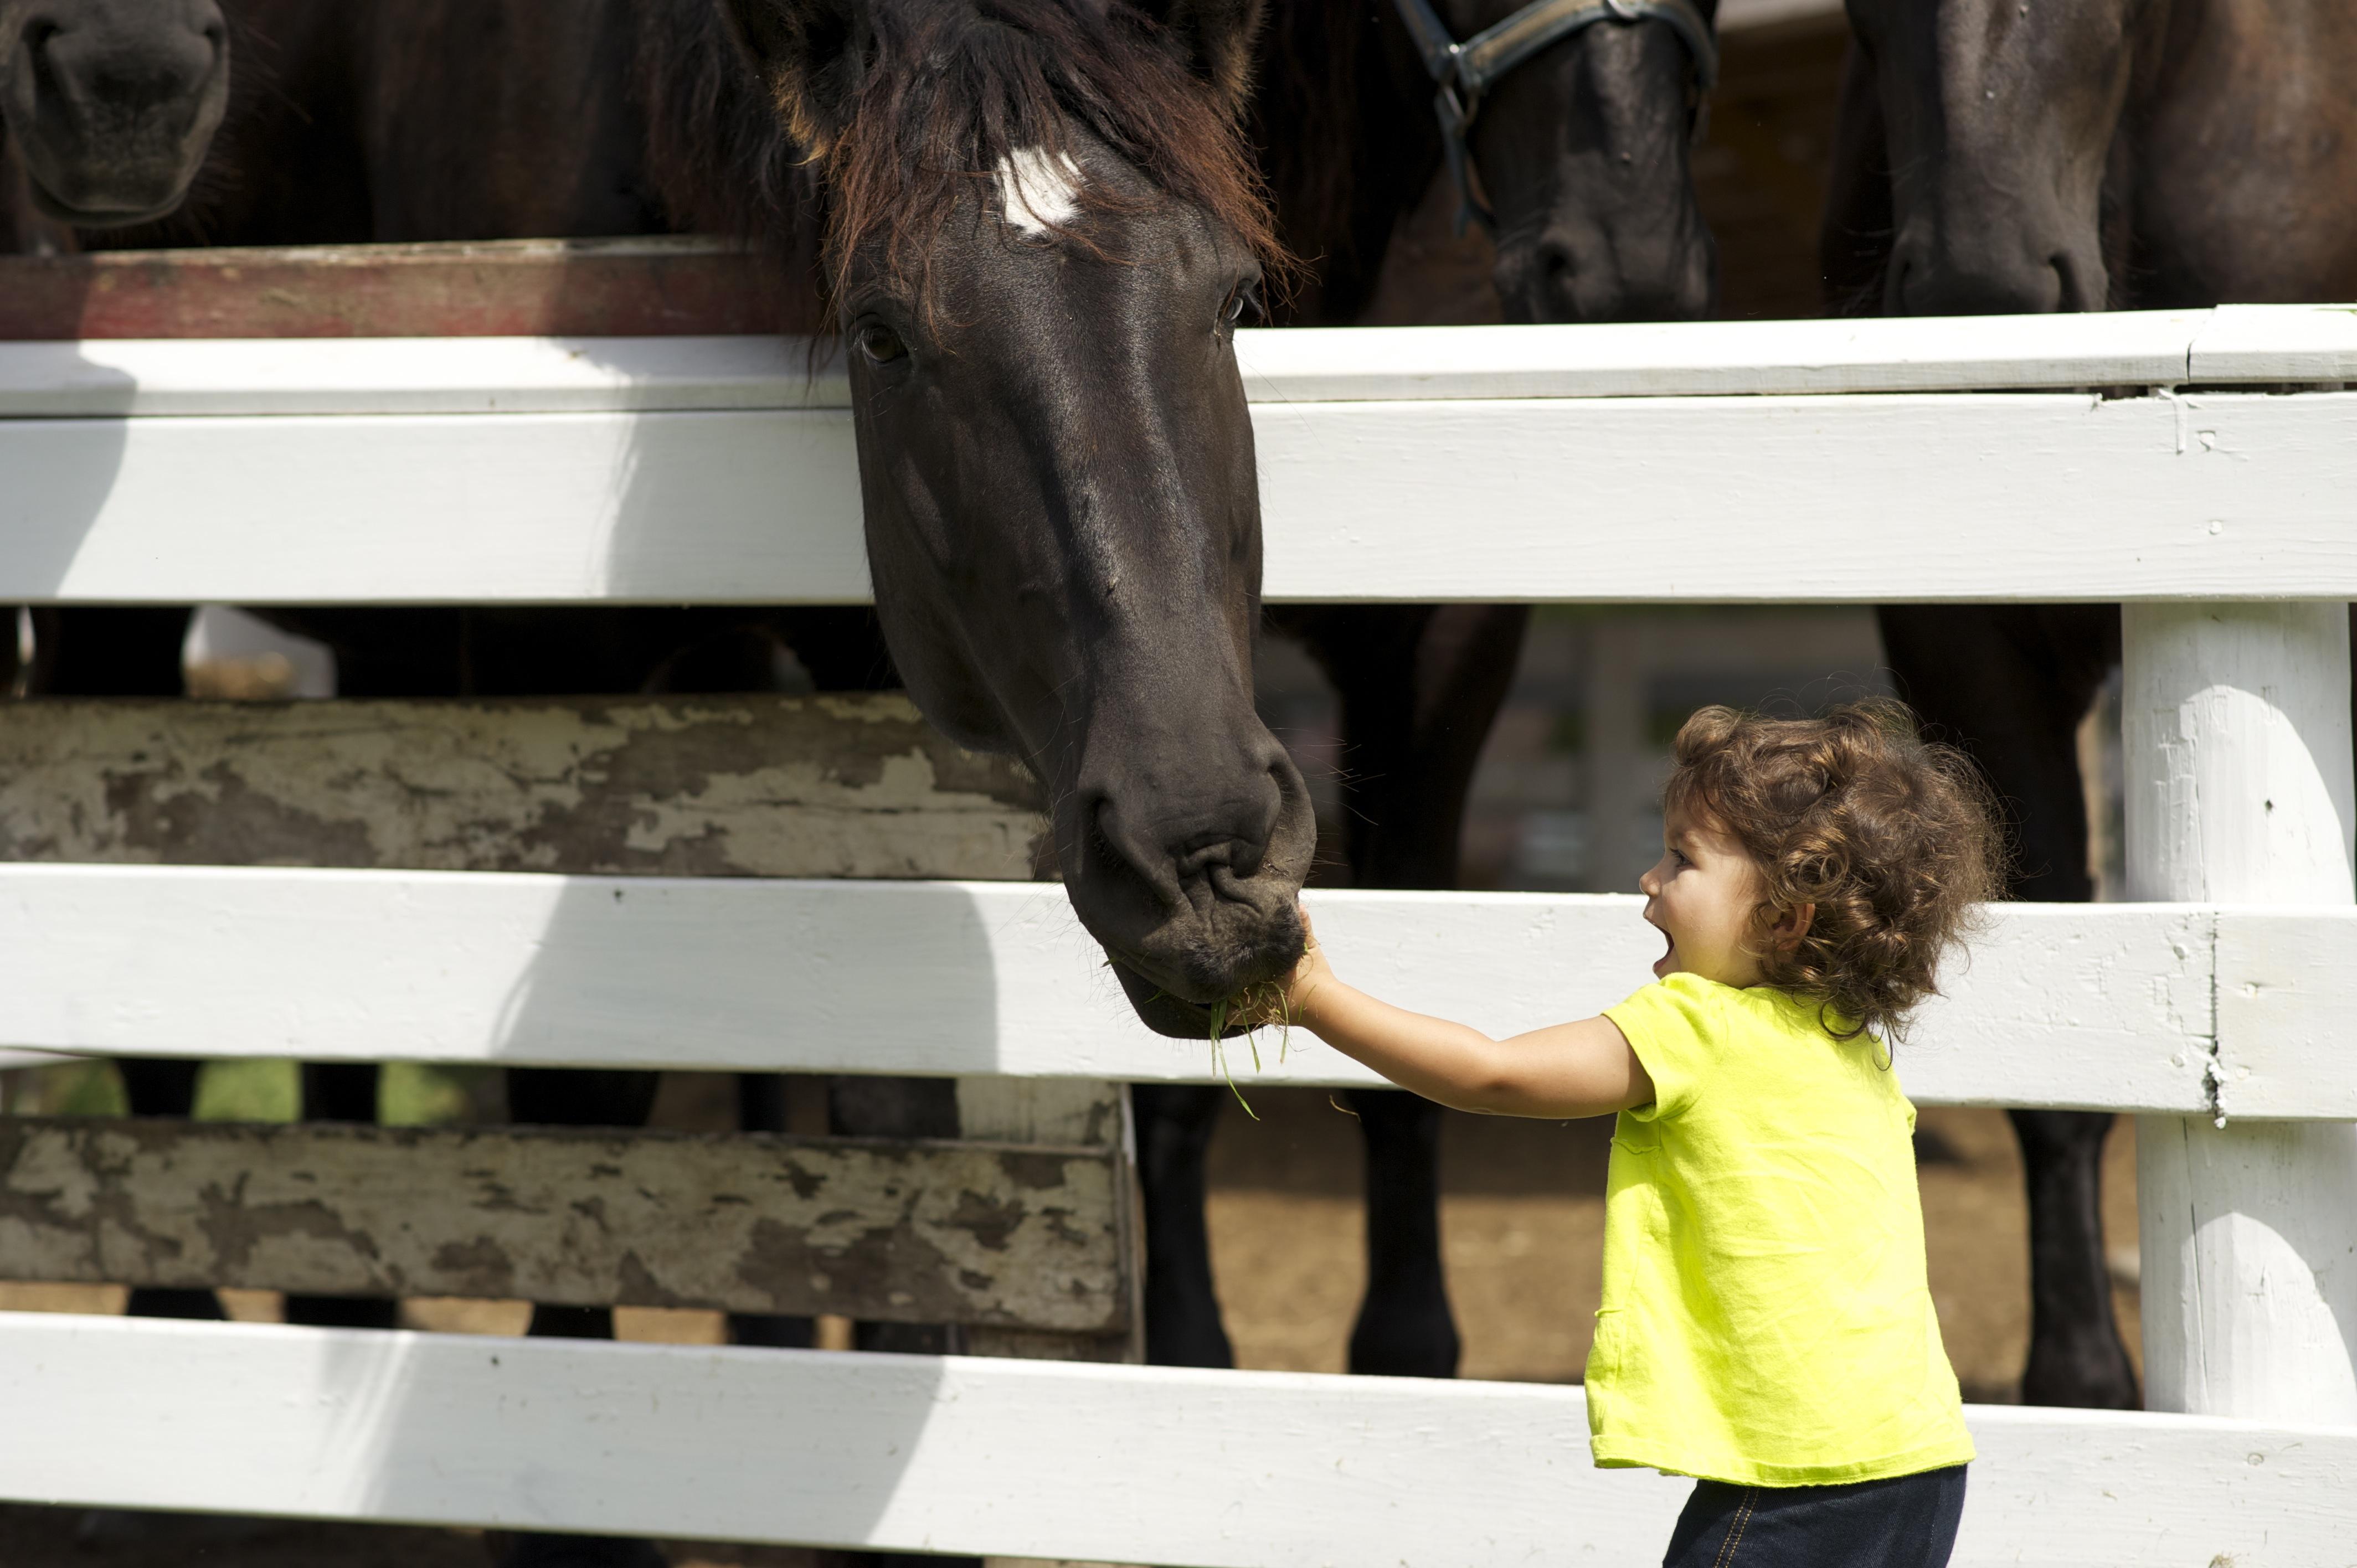 Leila feeding a horse, Callum Gray